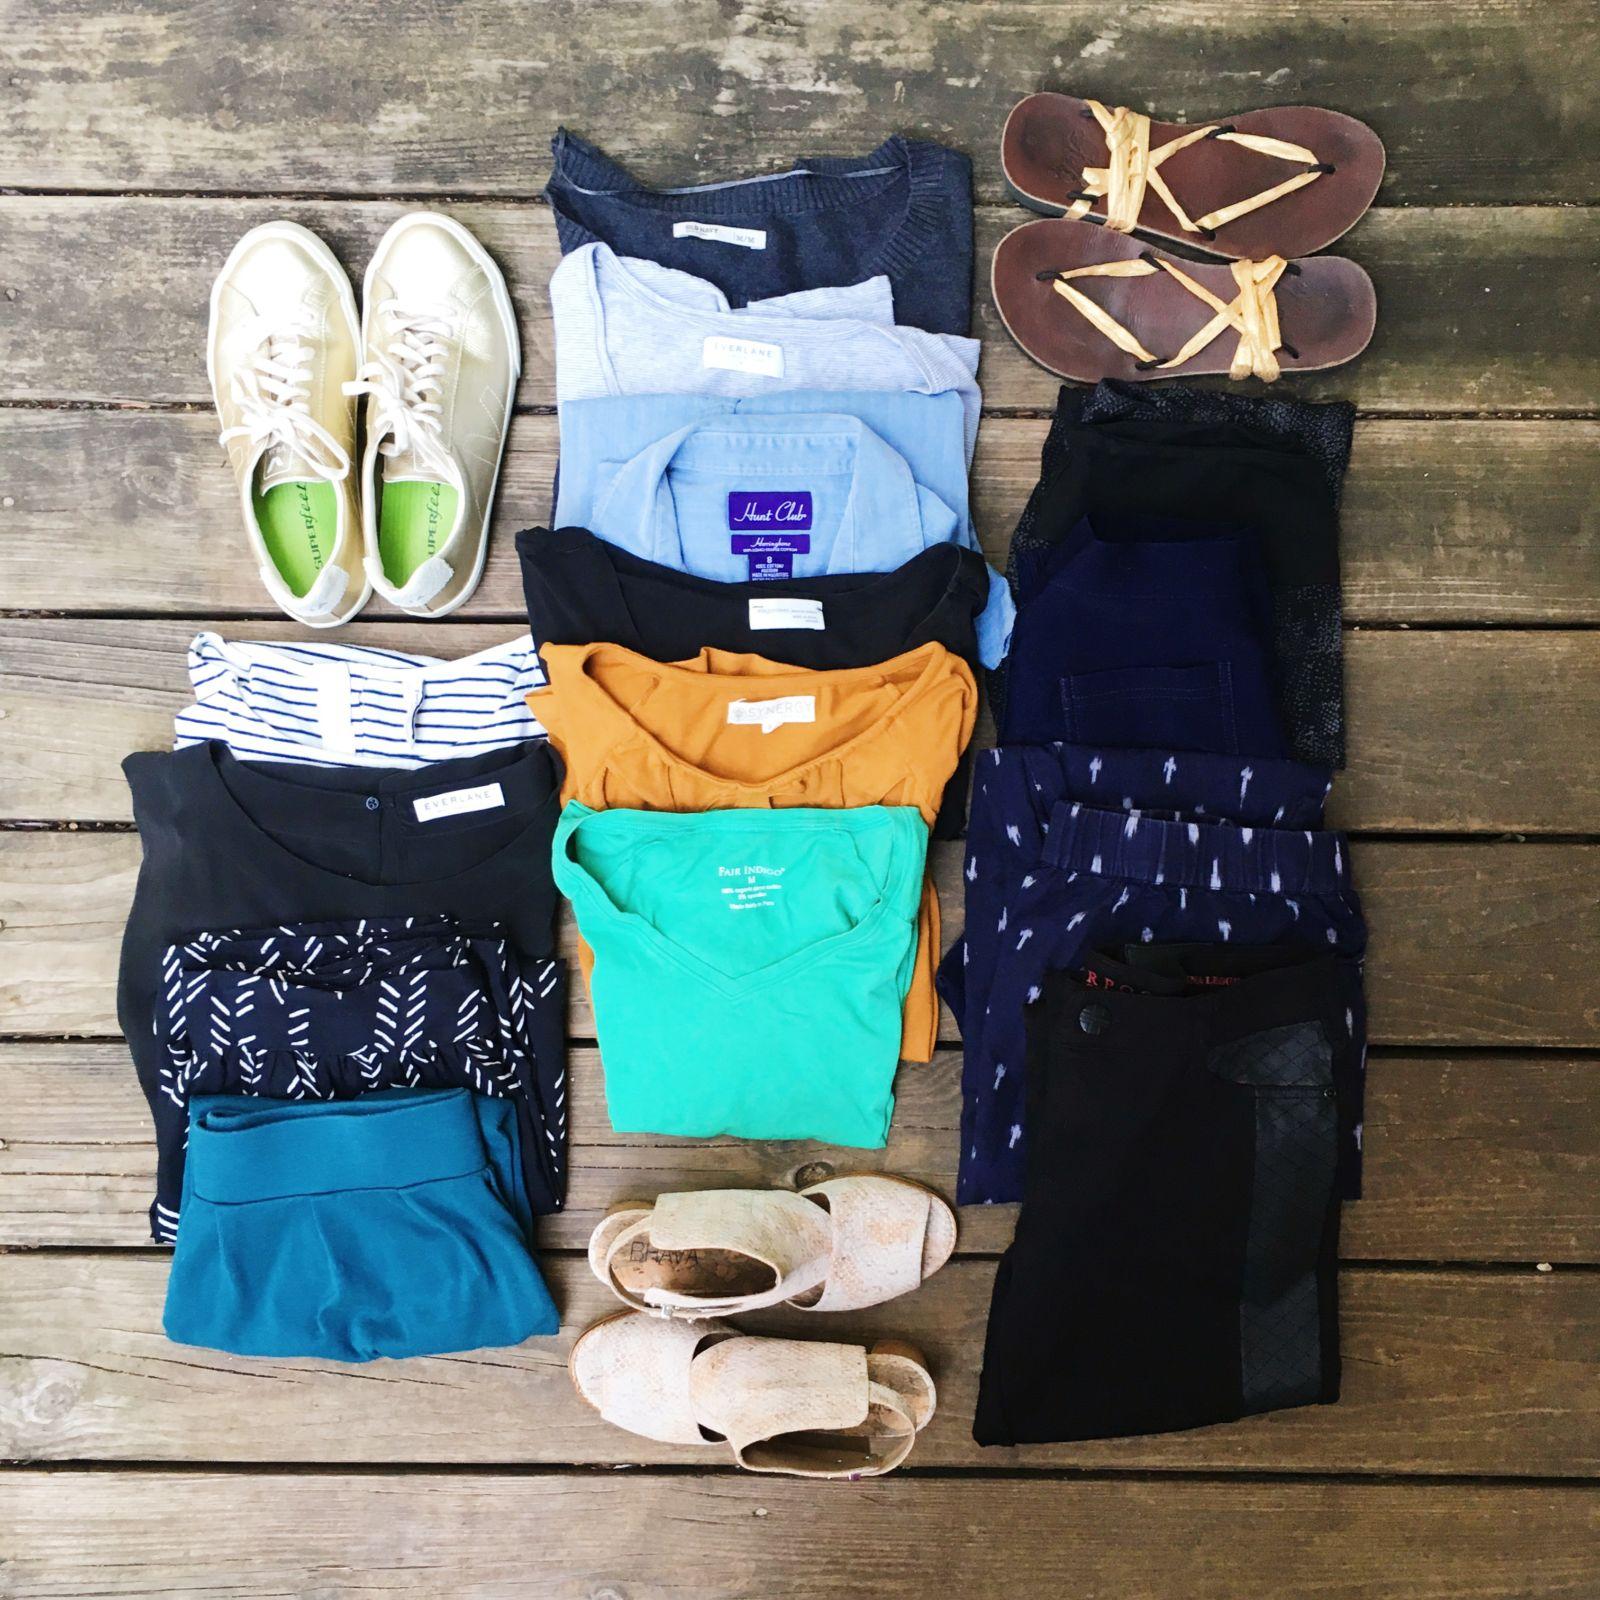 dress-well-do-good-minimalist-travel